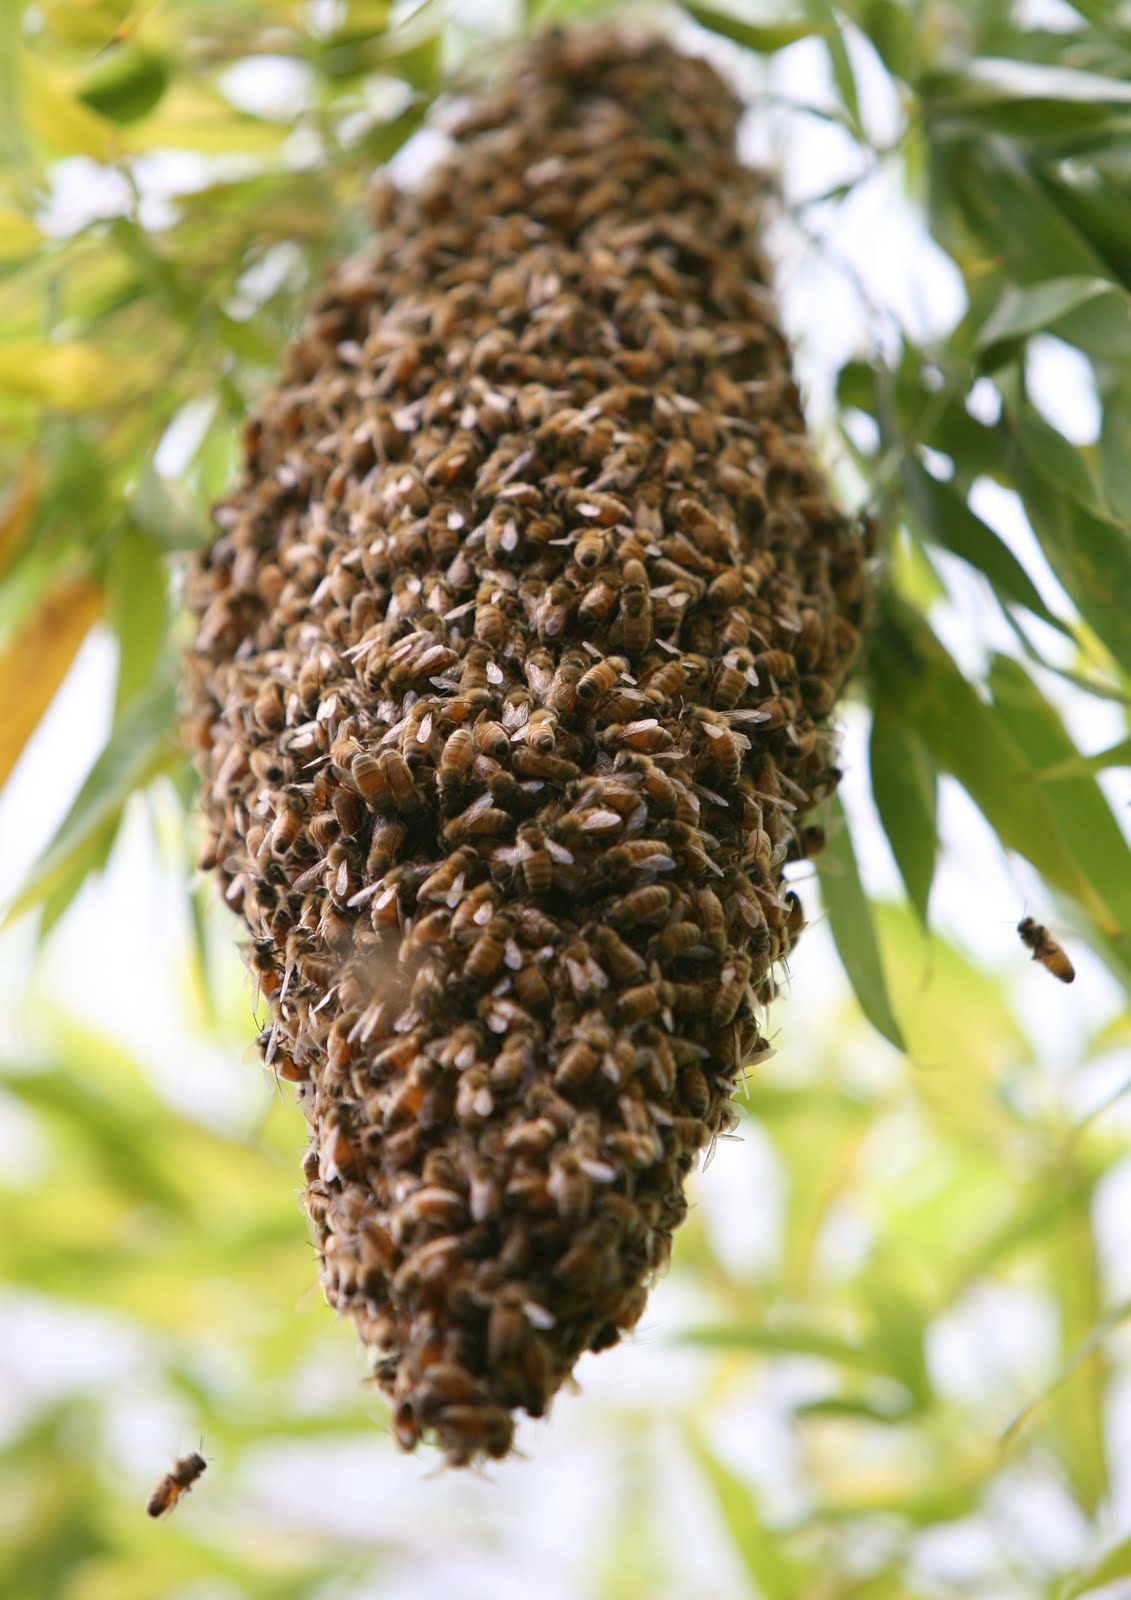 DIRECTORATE OF BEE-KEEPING : December 2012 - photo#24